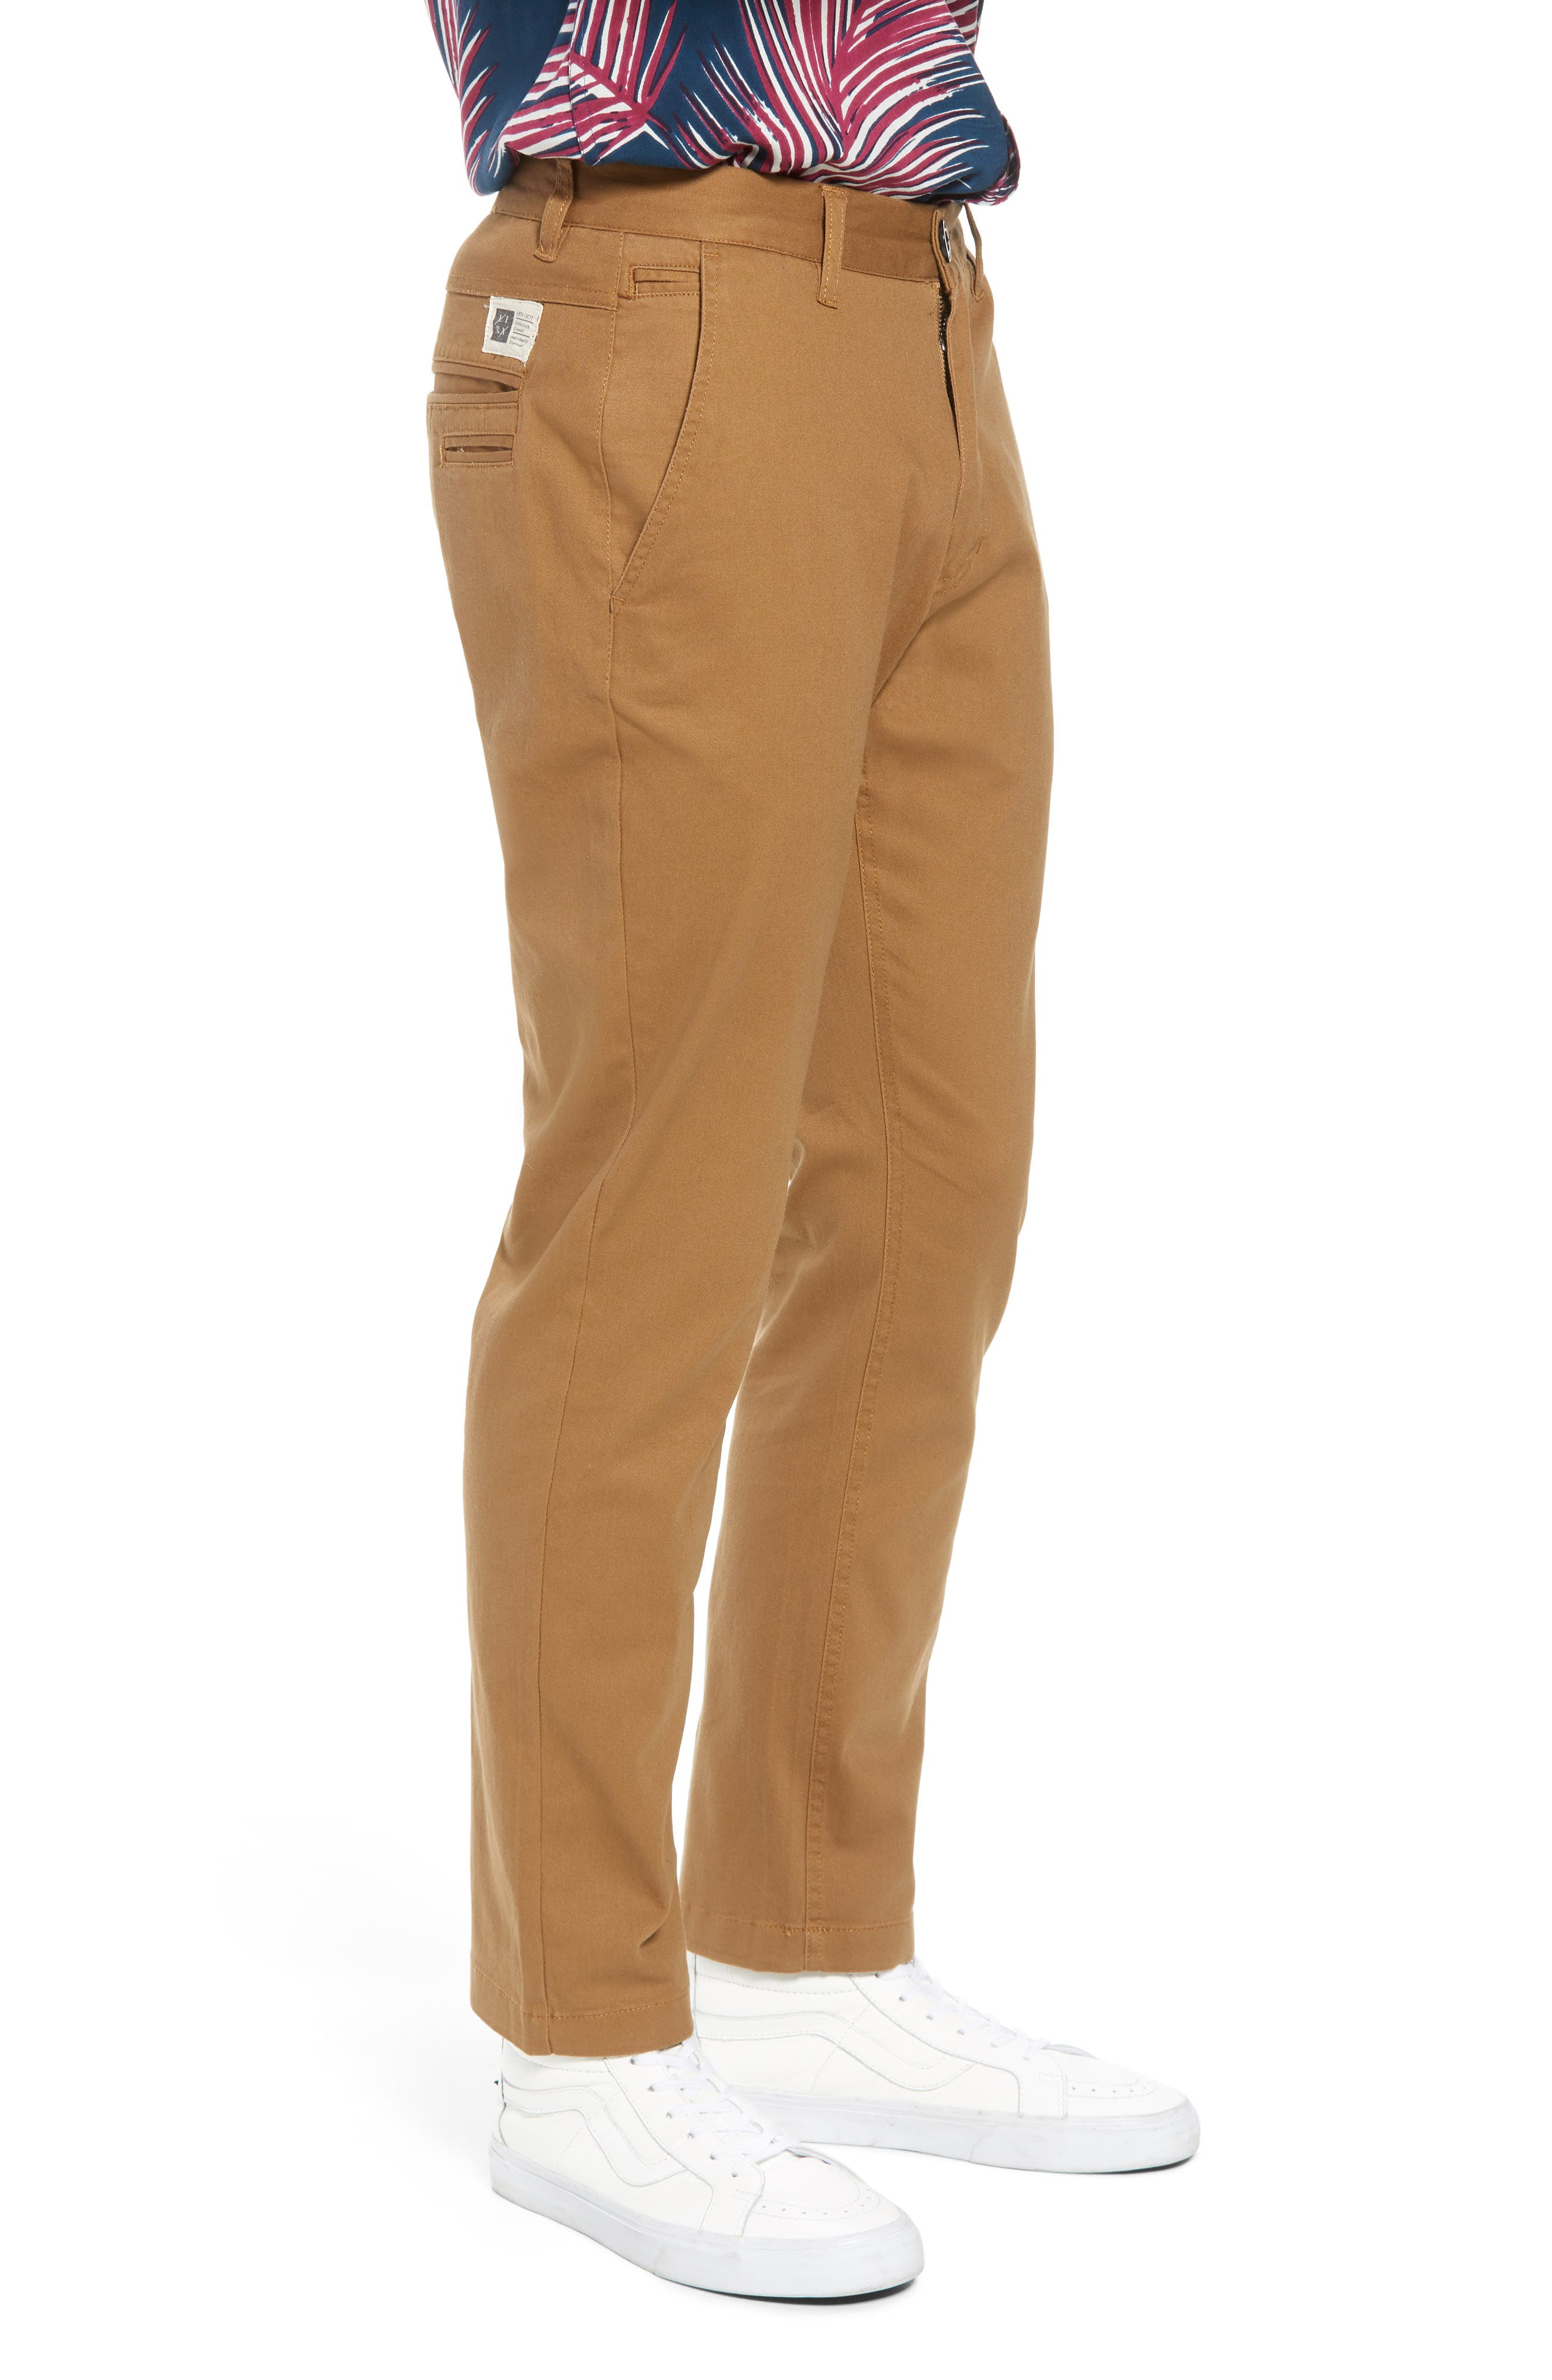 Crossroad Slim Fit Pants,                             Alternate thumbnail 3, color,                             Khaki